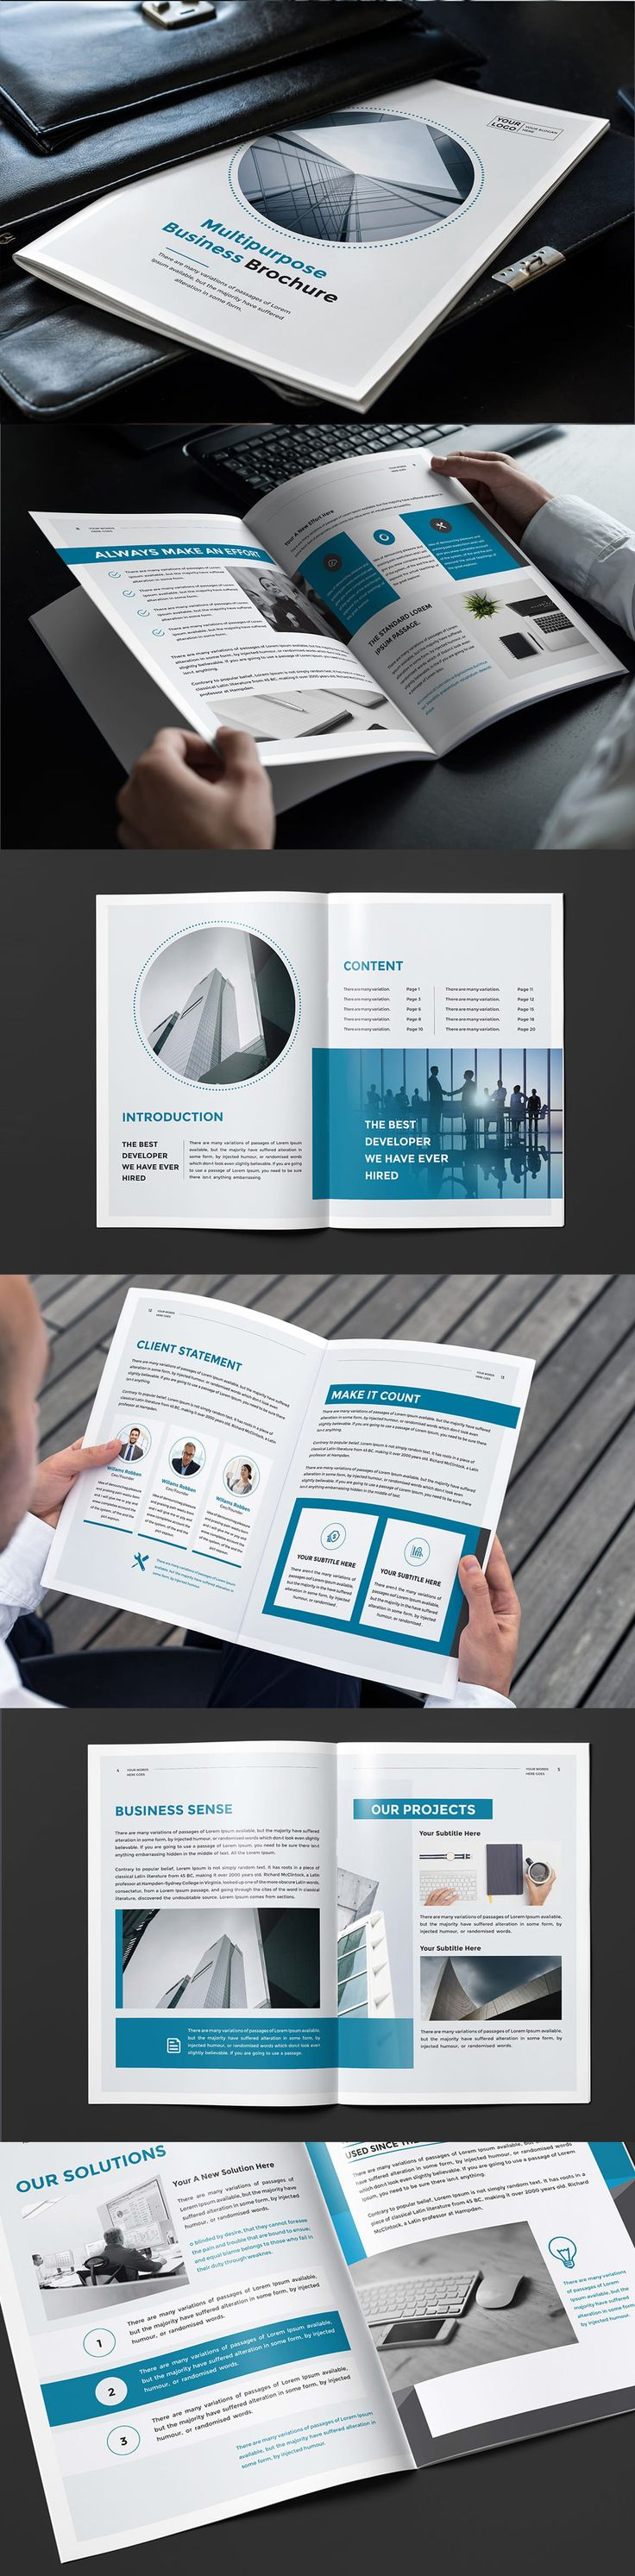 Blue Business Brochure Template InDesign INDD